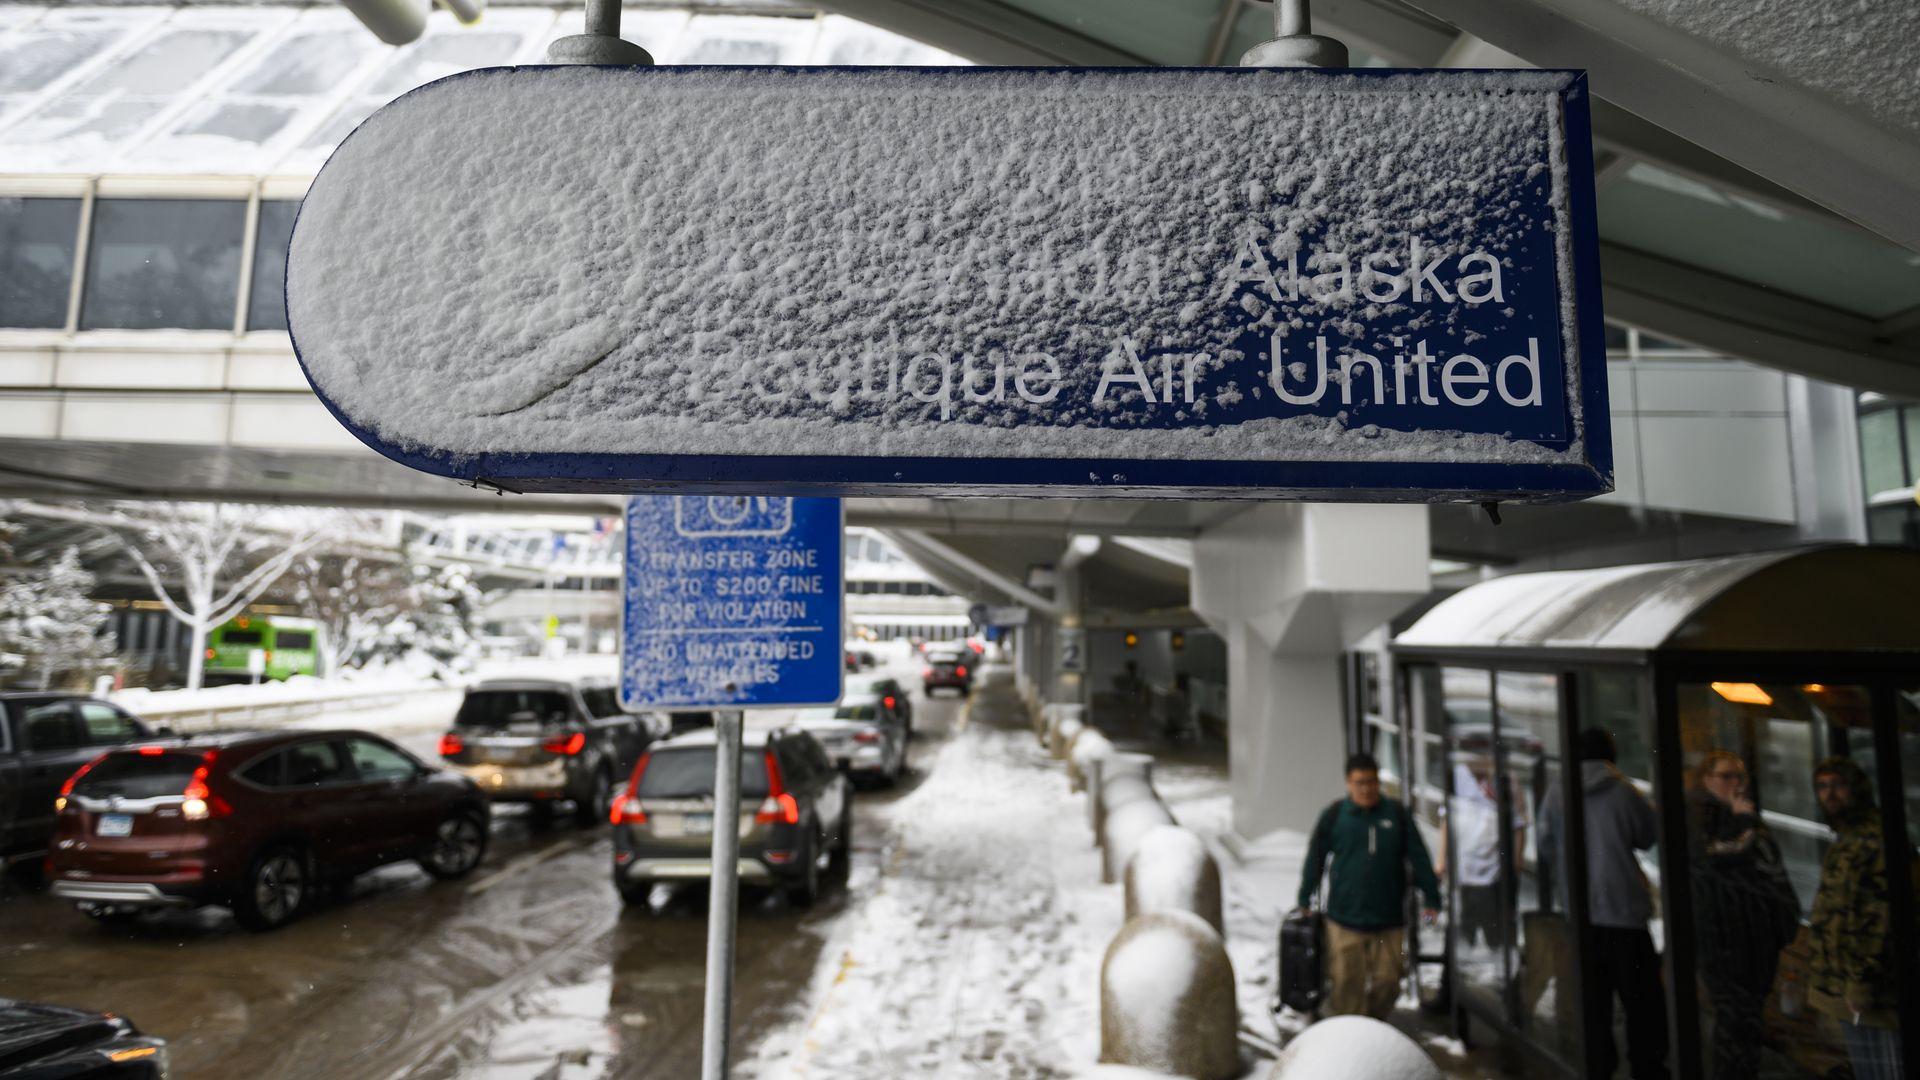 Minneapolis-St. Paul International Airport after a blizzard struck overnight in Bloomington, Minnesota.